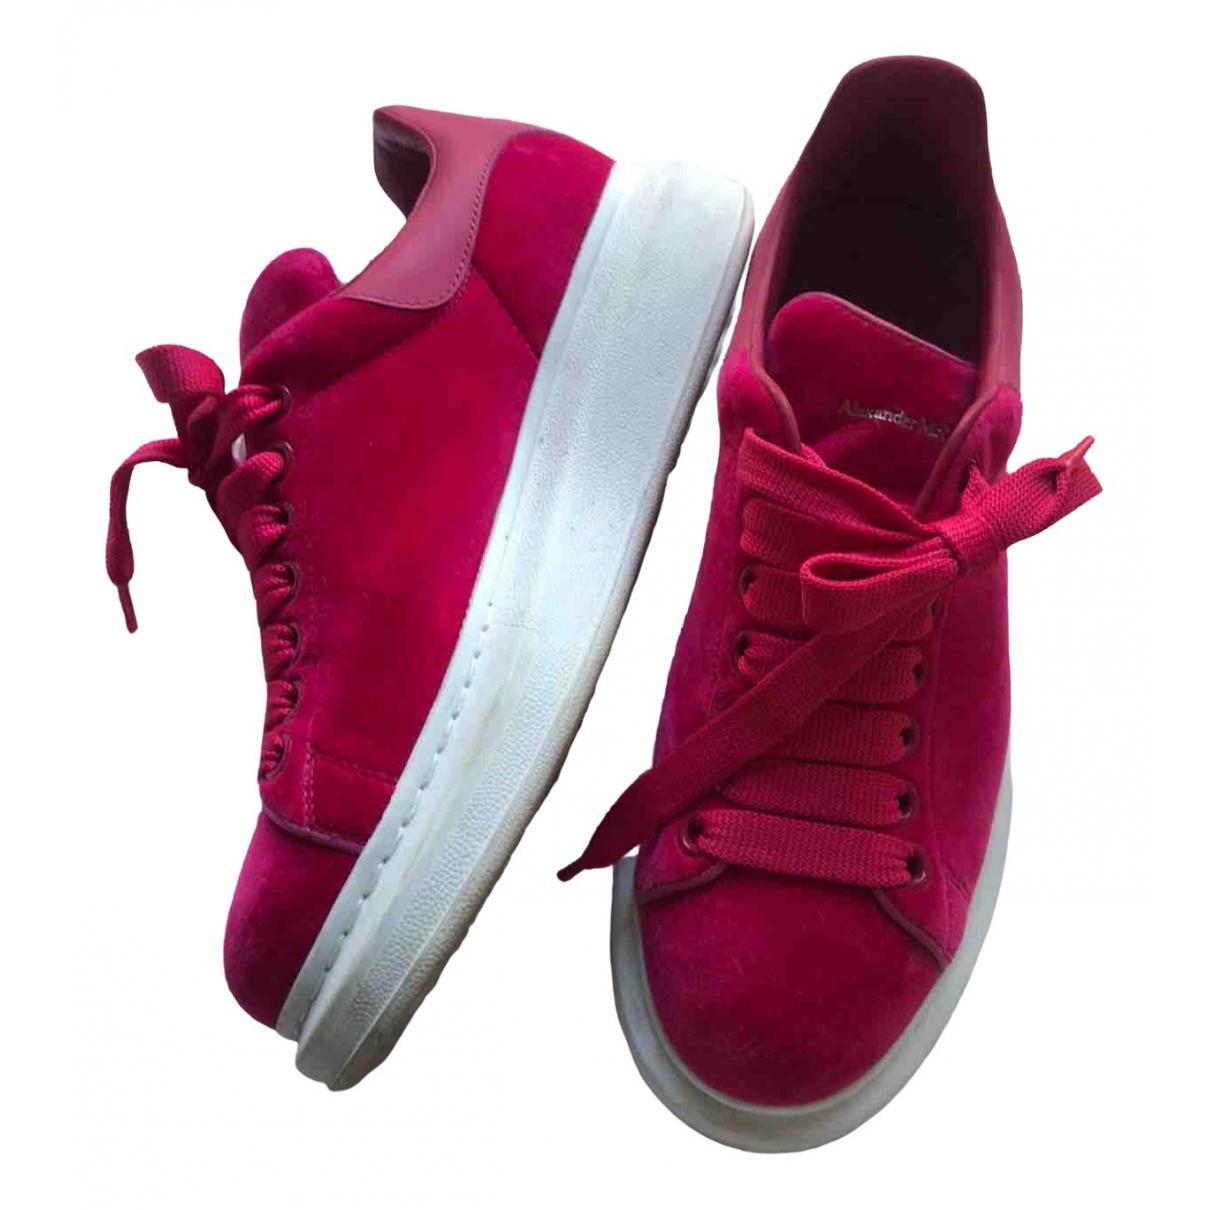 Alexander Mcqueen - Baskets Oversize pour femme en velours - rose